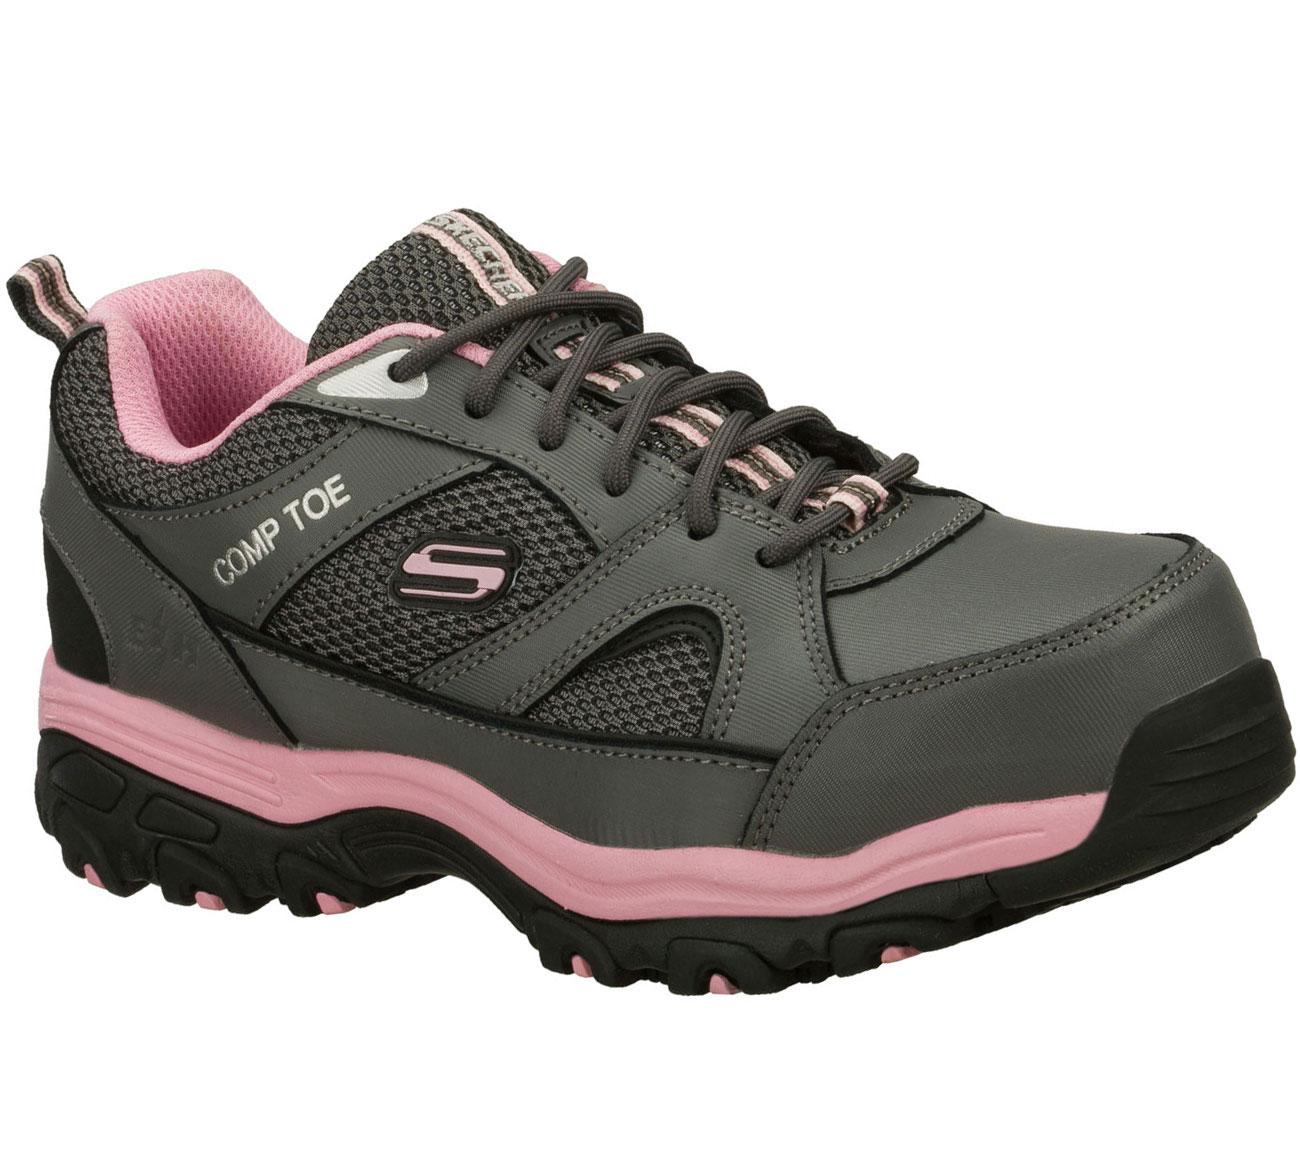 Women's Composite Toe Converse C455 Cross Trainer Work Shoes, Light Gray / Pink